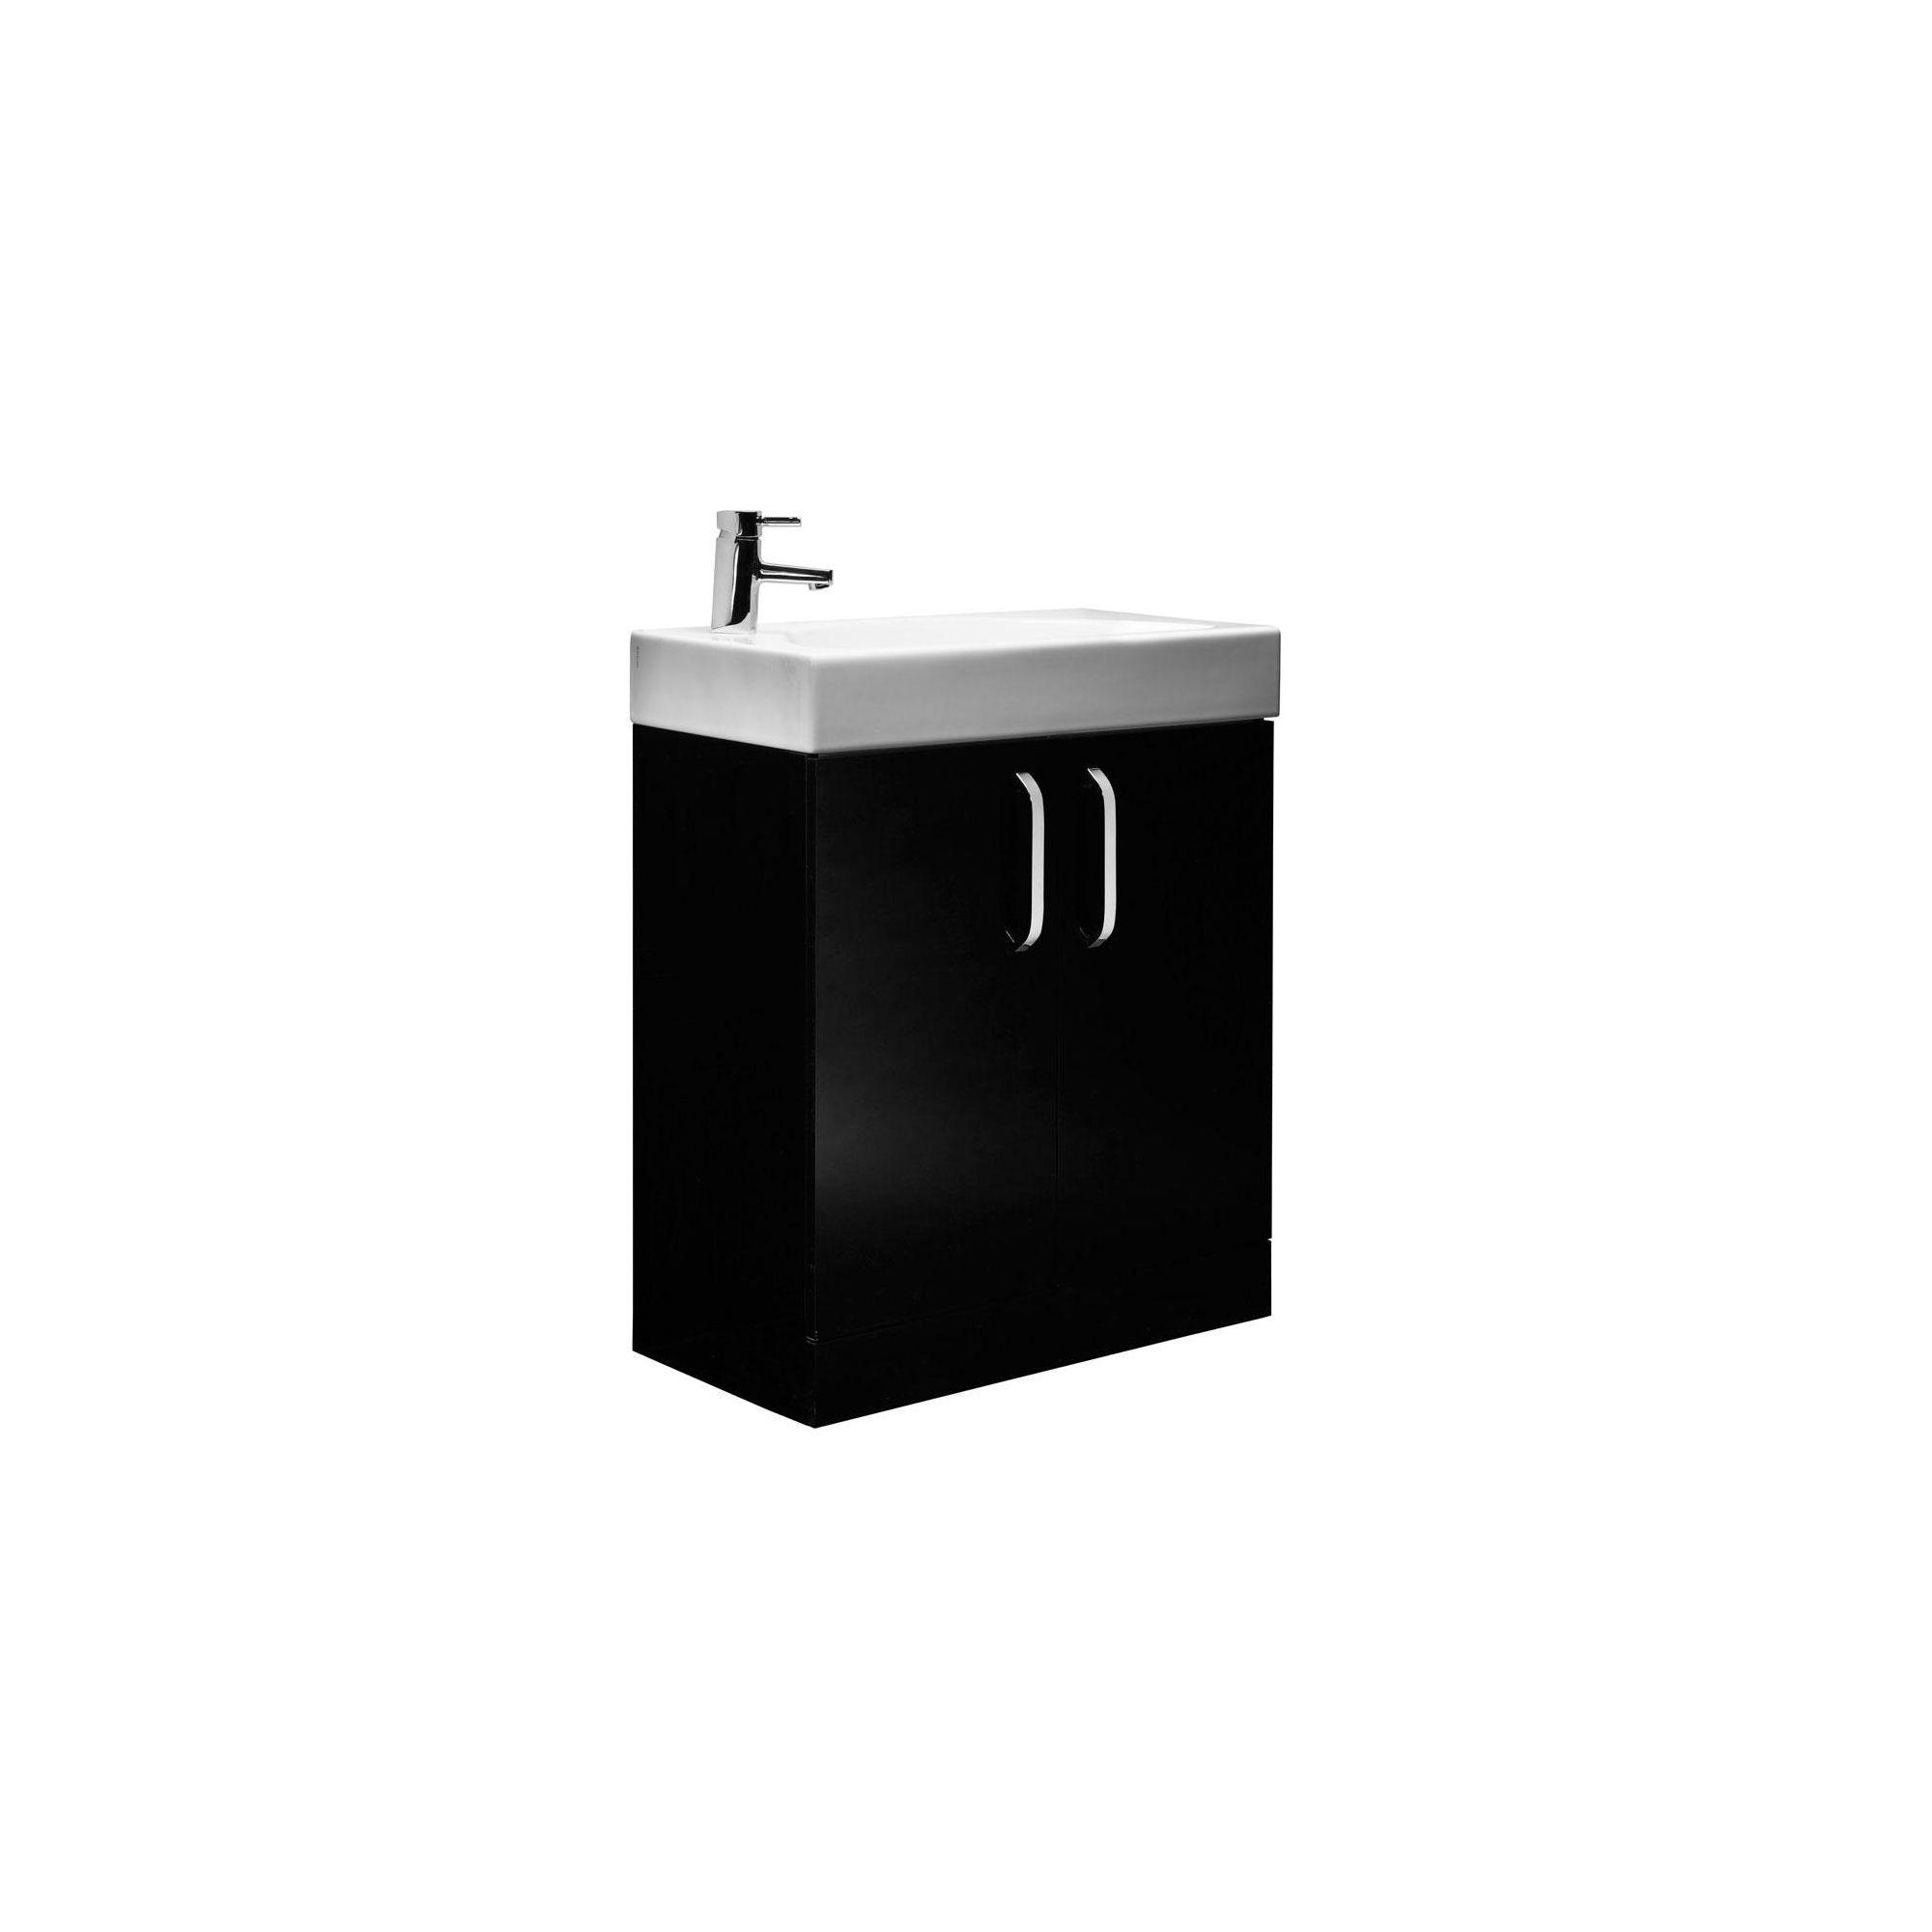 Tavistock Arc Black Floor Standing Cabinet And Basin 1